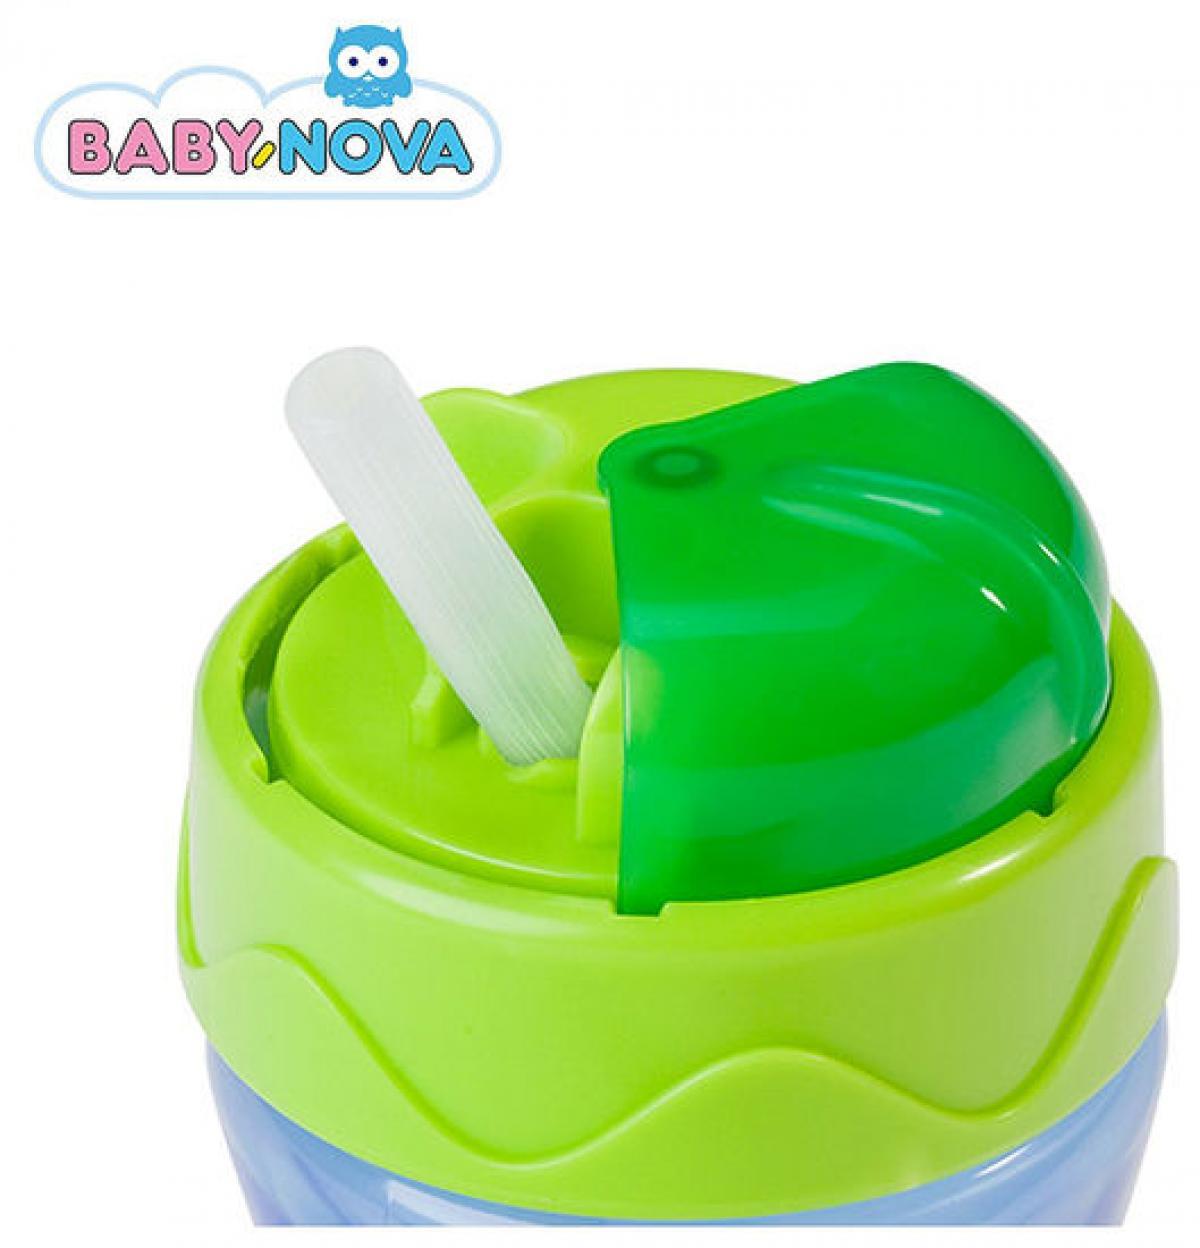 Baby Nova 2er Set Trinkhalmbecher Strohalmbecher Silikon 2er Set in blau